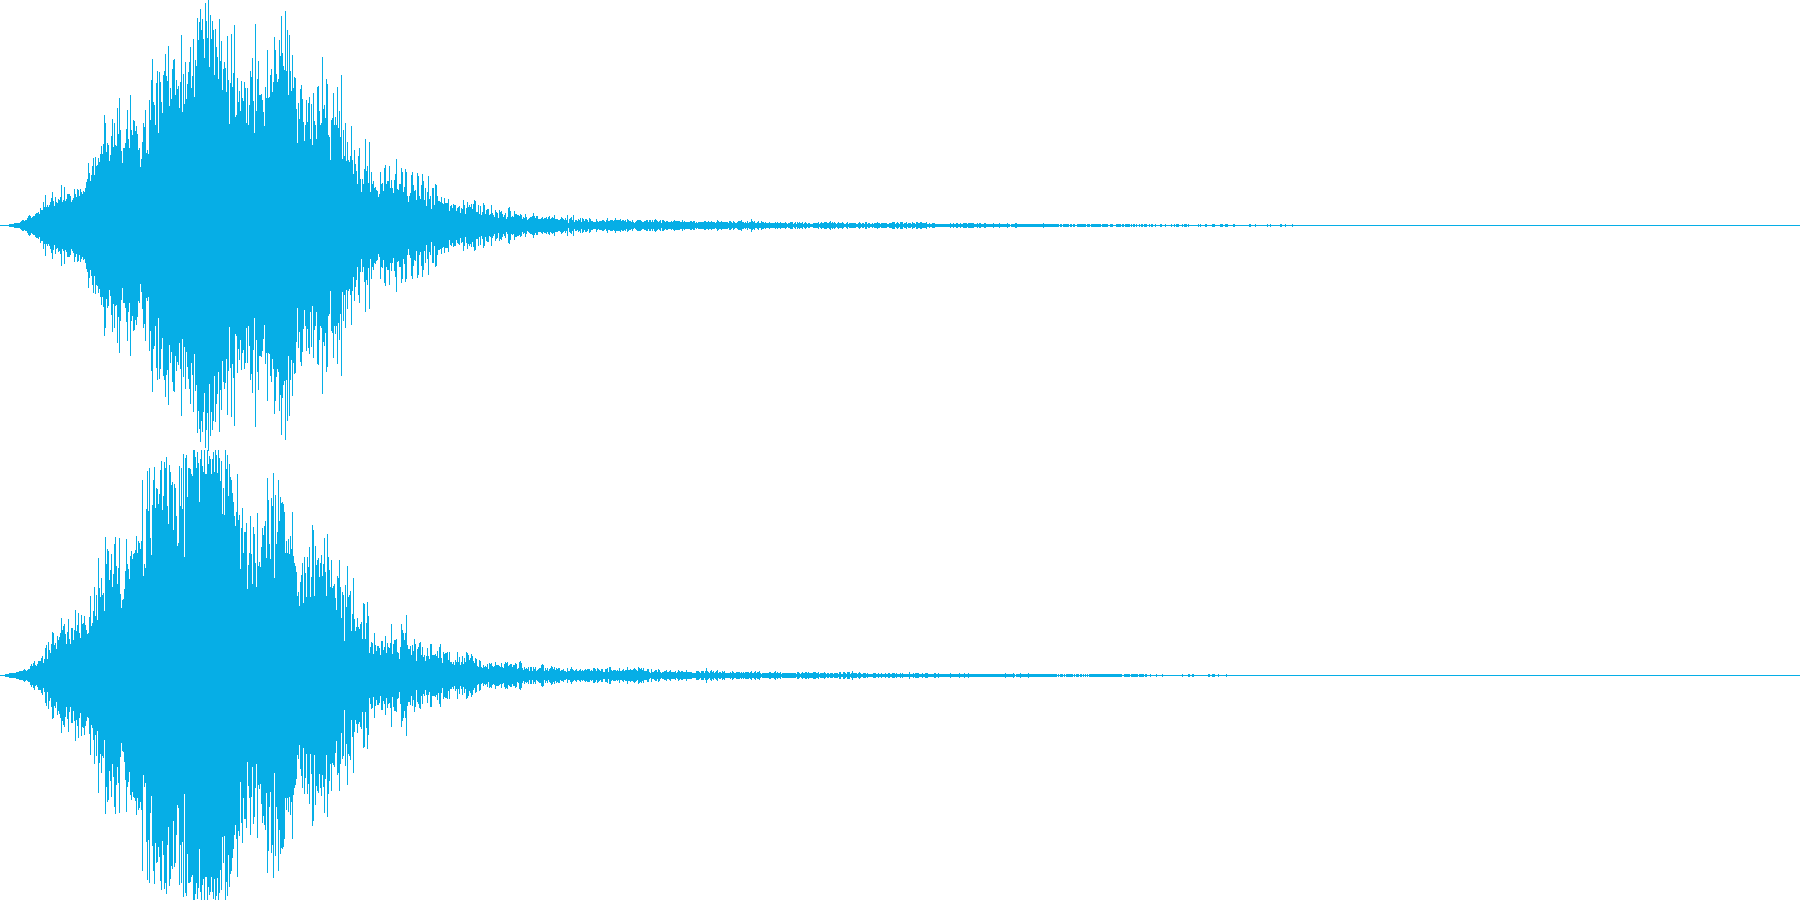 CINEMATIC Sound FXの再生済みの波形